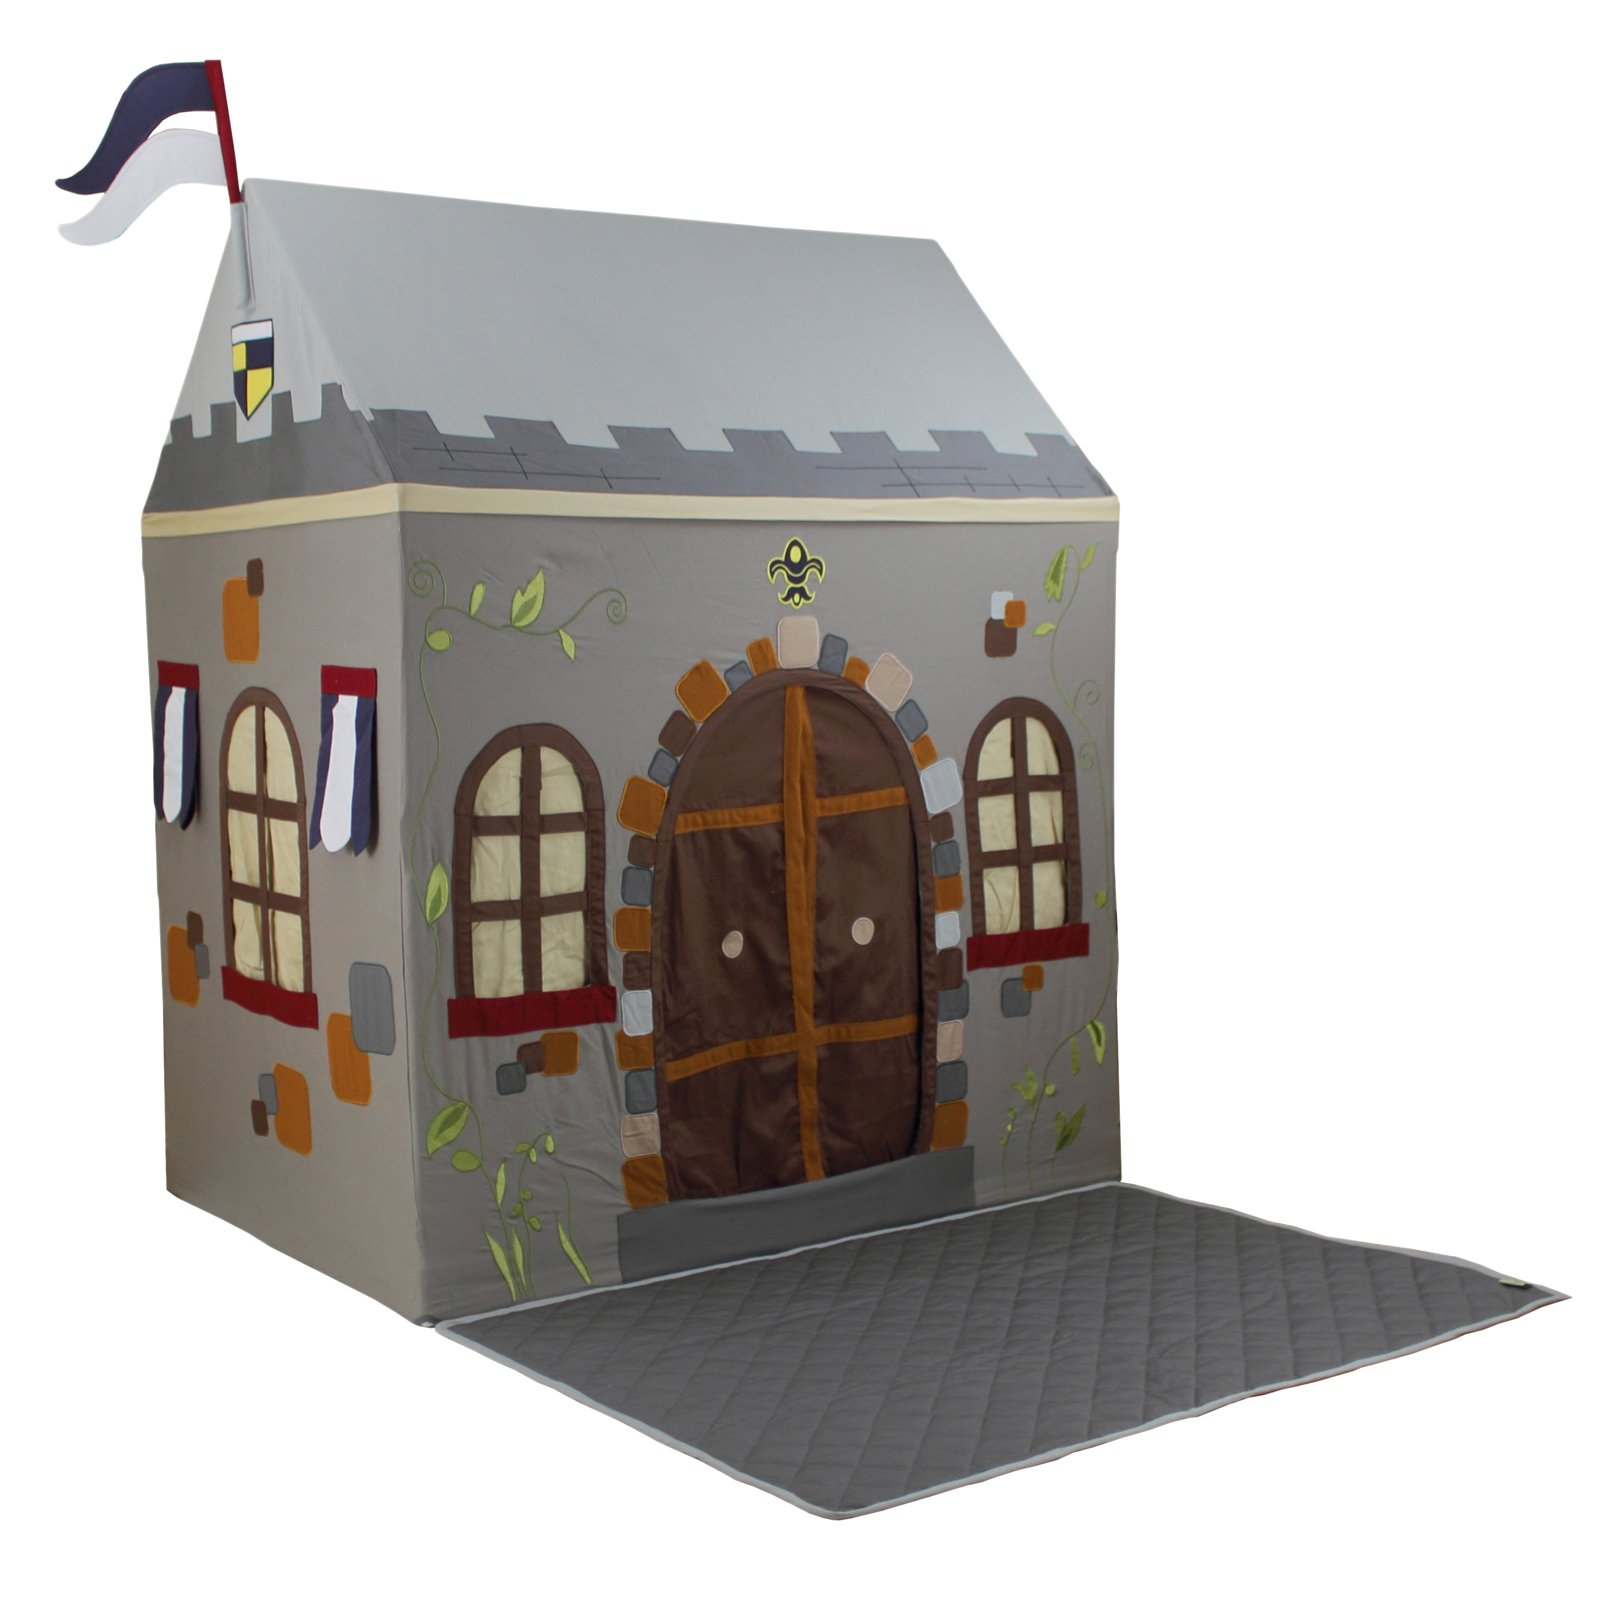 Dexton Toadi Castle Playhouse and Floor Quilt